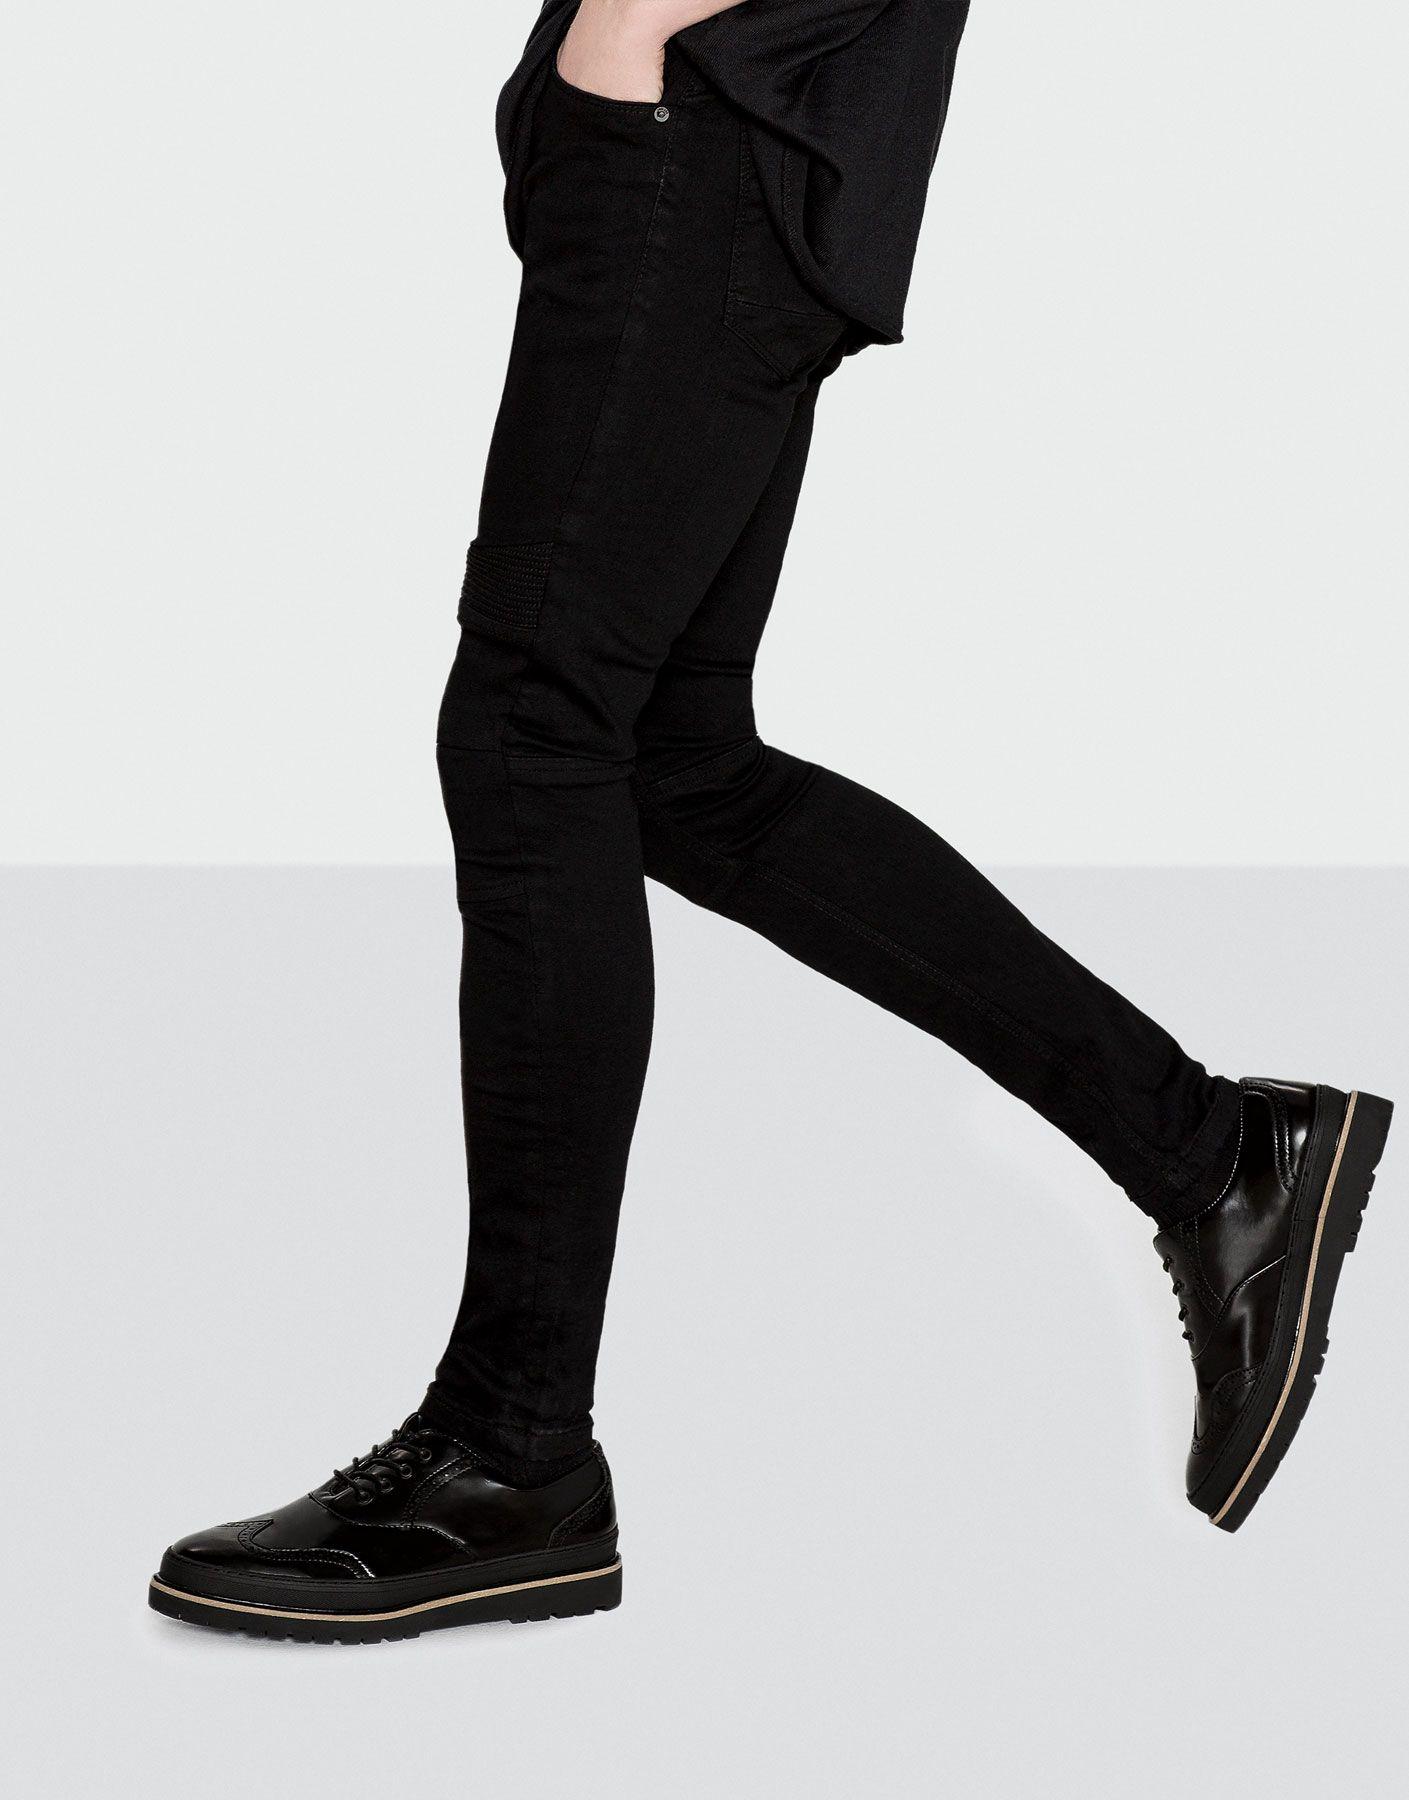 Moda Hombre Blucher Zapatos amp;bear EspañaCosas Calzado Pull L4jq5Ac3RS